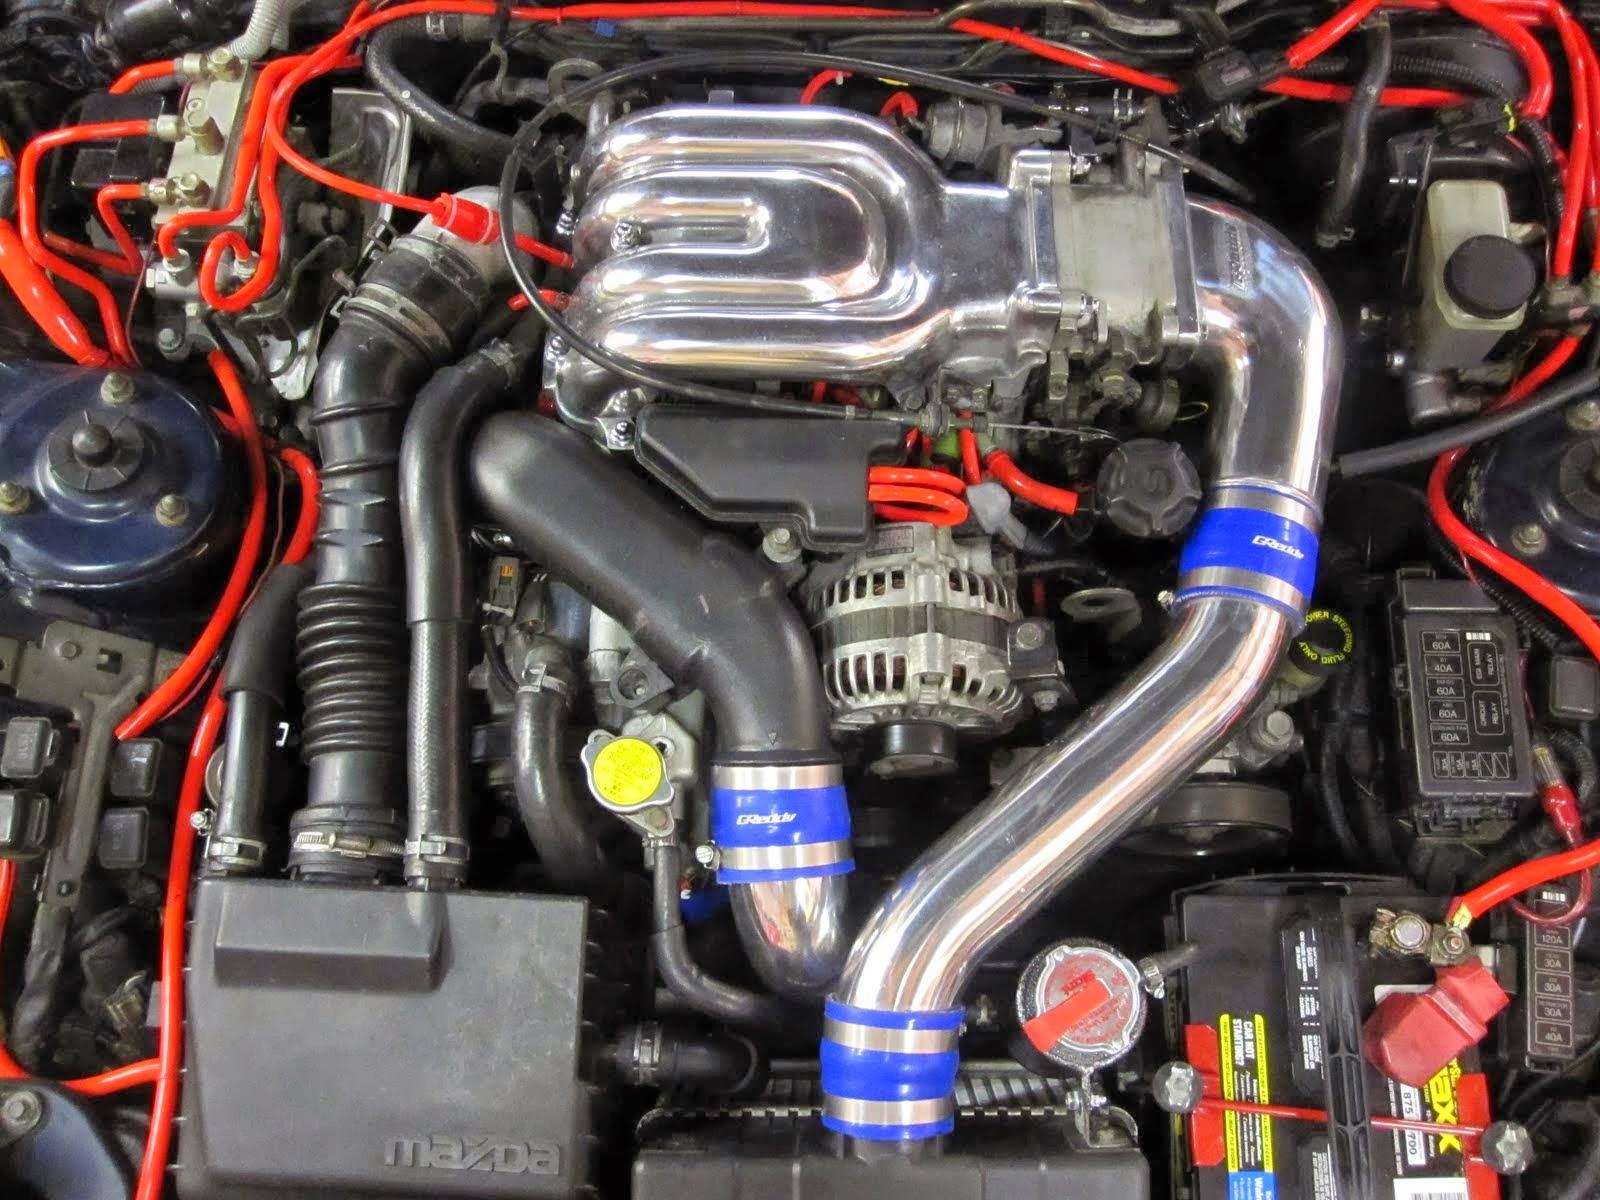 2016 Mazda RX7 engine